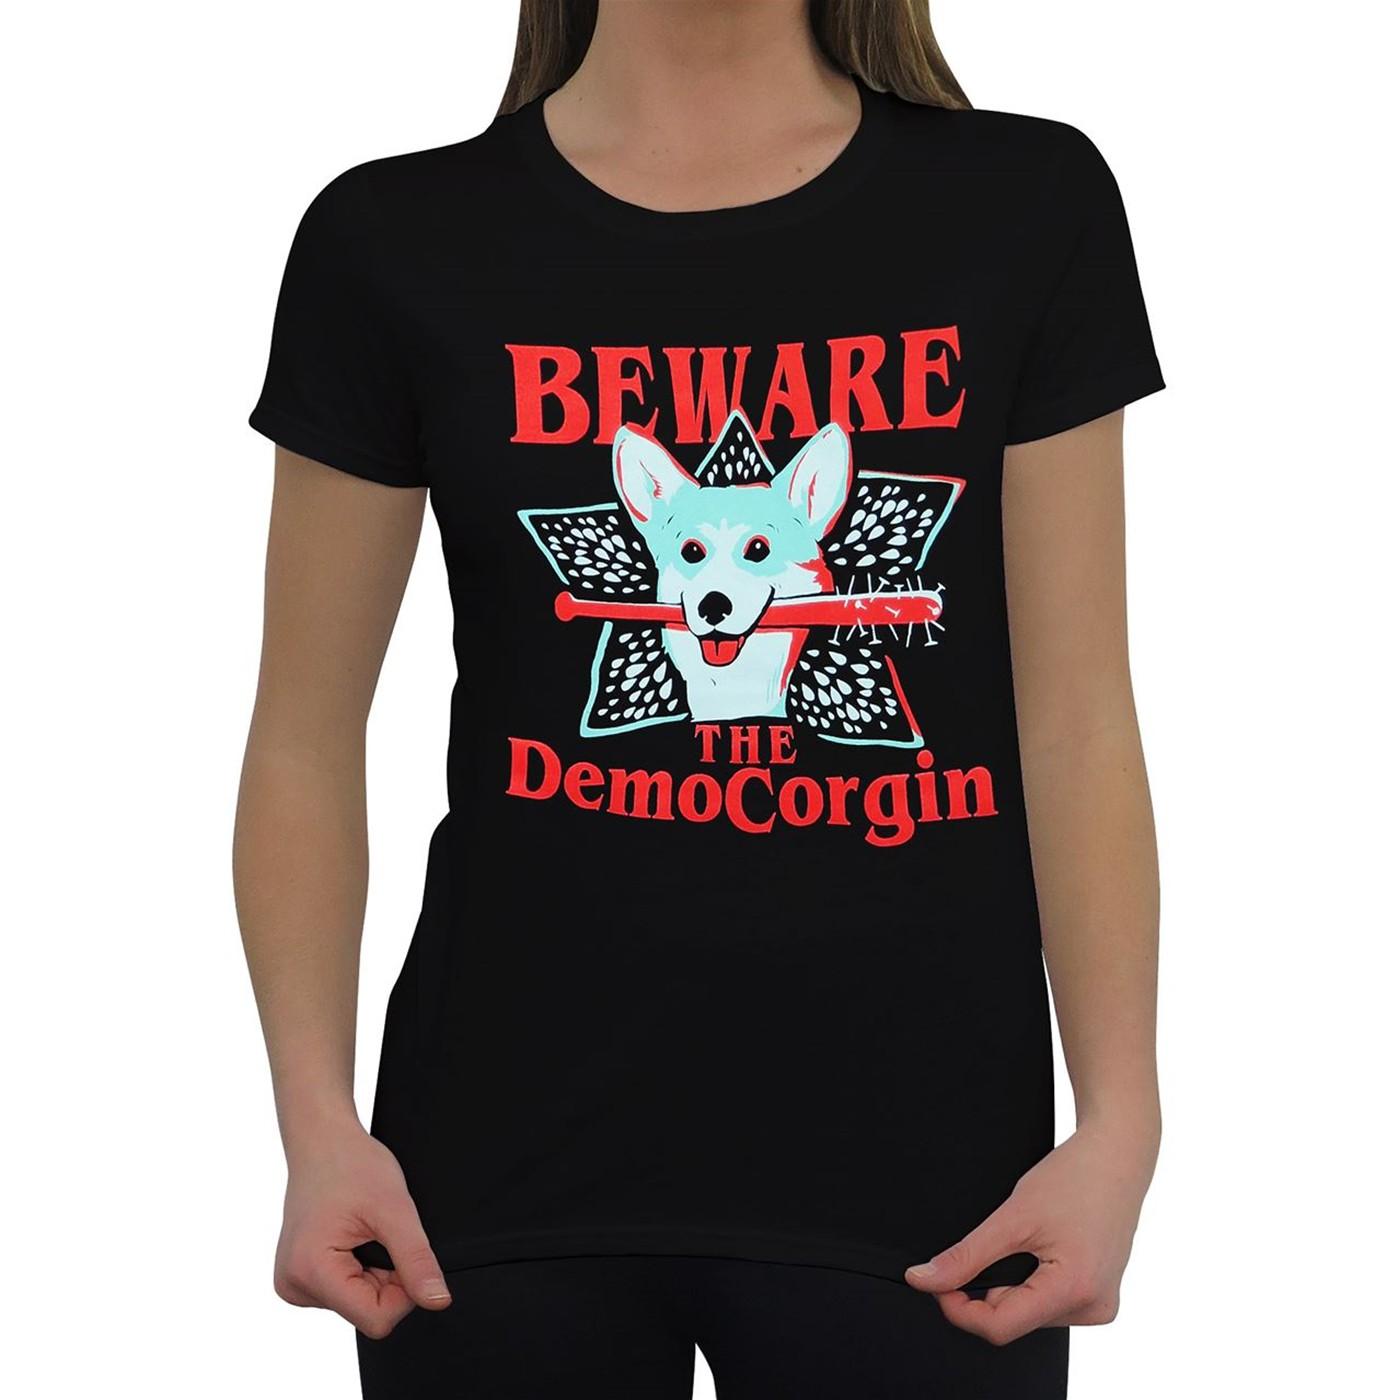 Beware the Democorgin Women's T-Shirt